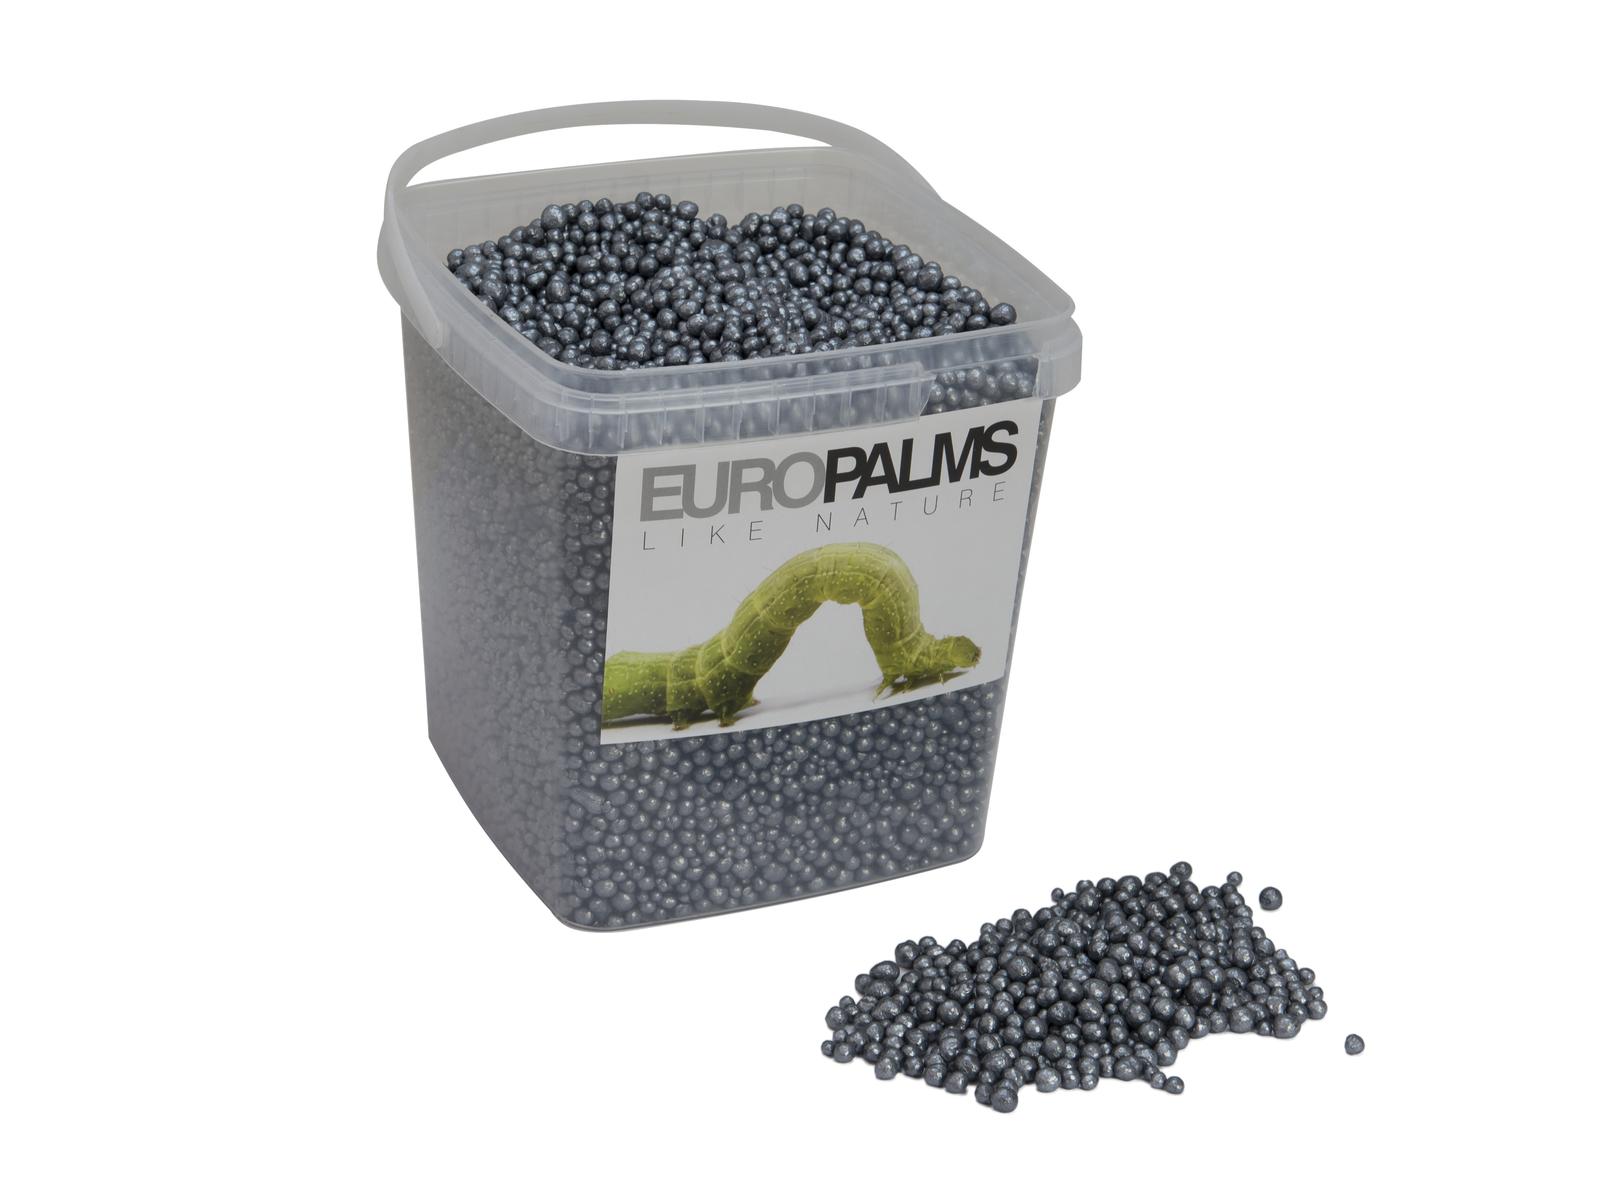 EUROPALMS Idrocoltura substrato, beluga, sechhio da 5,5 LT